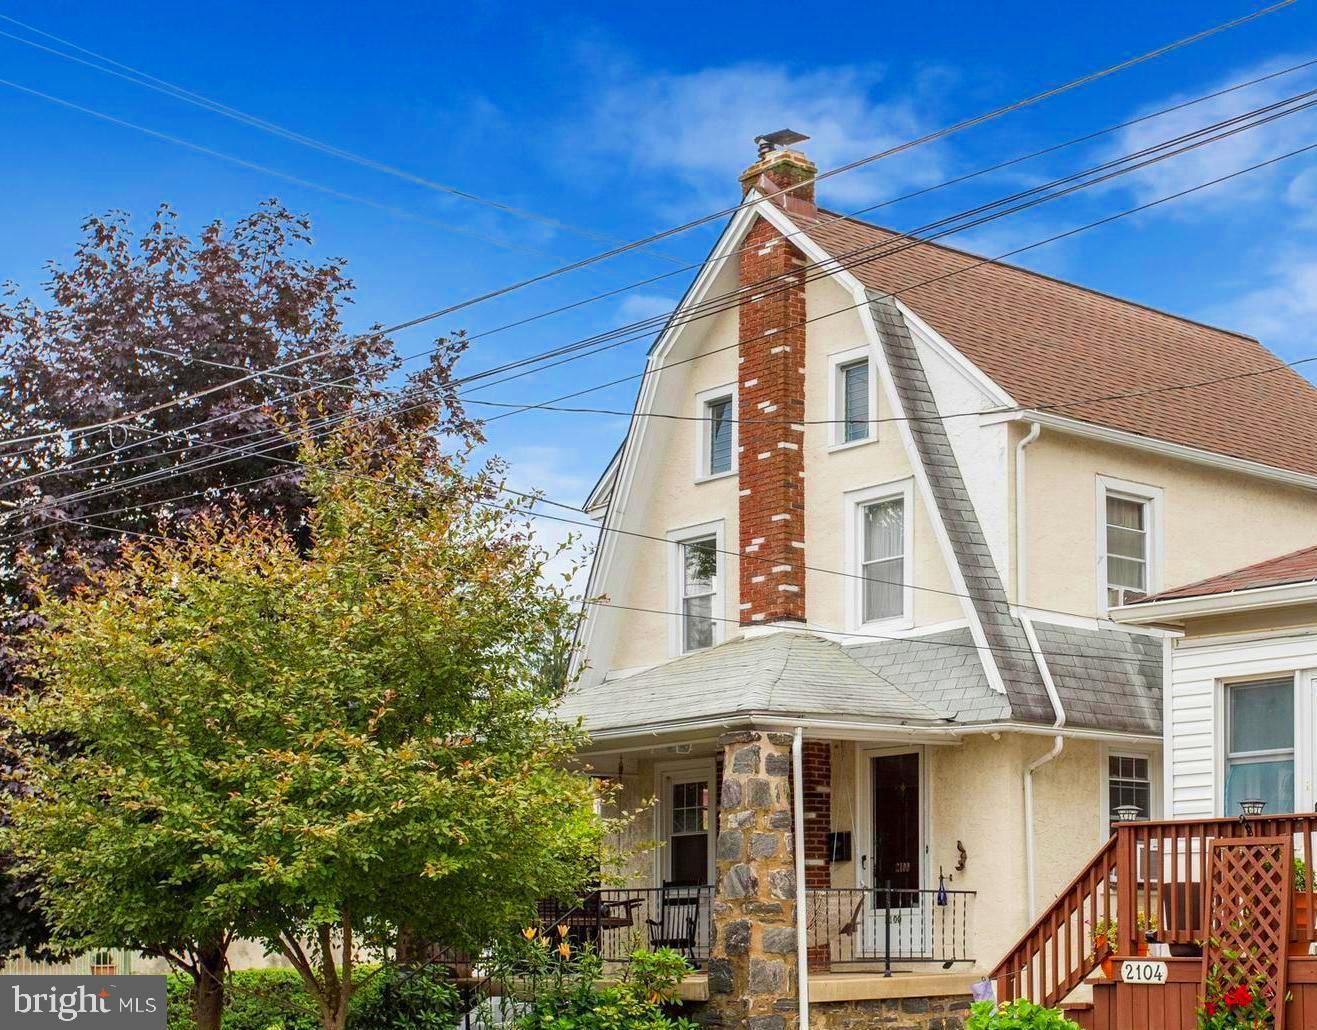 2100 Bellemead Avenue Havertown, PA 19083